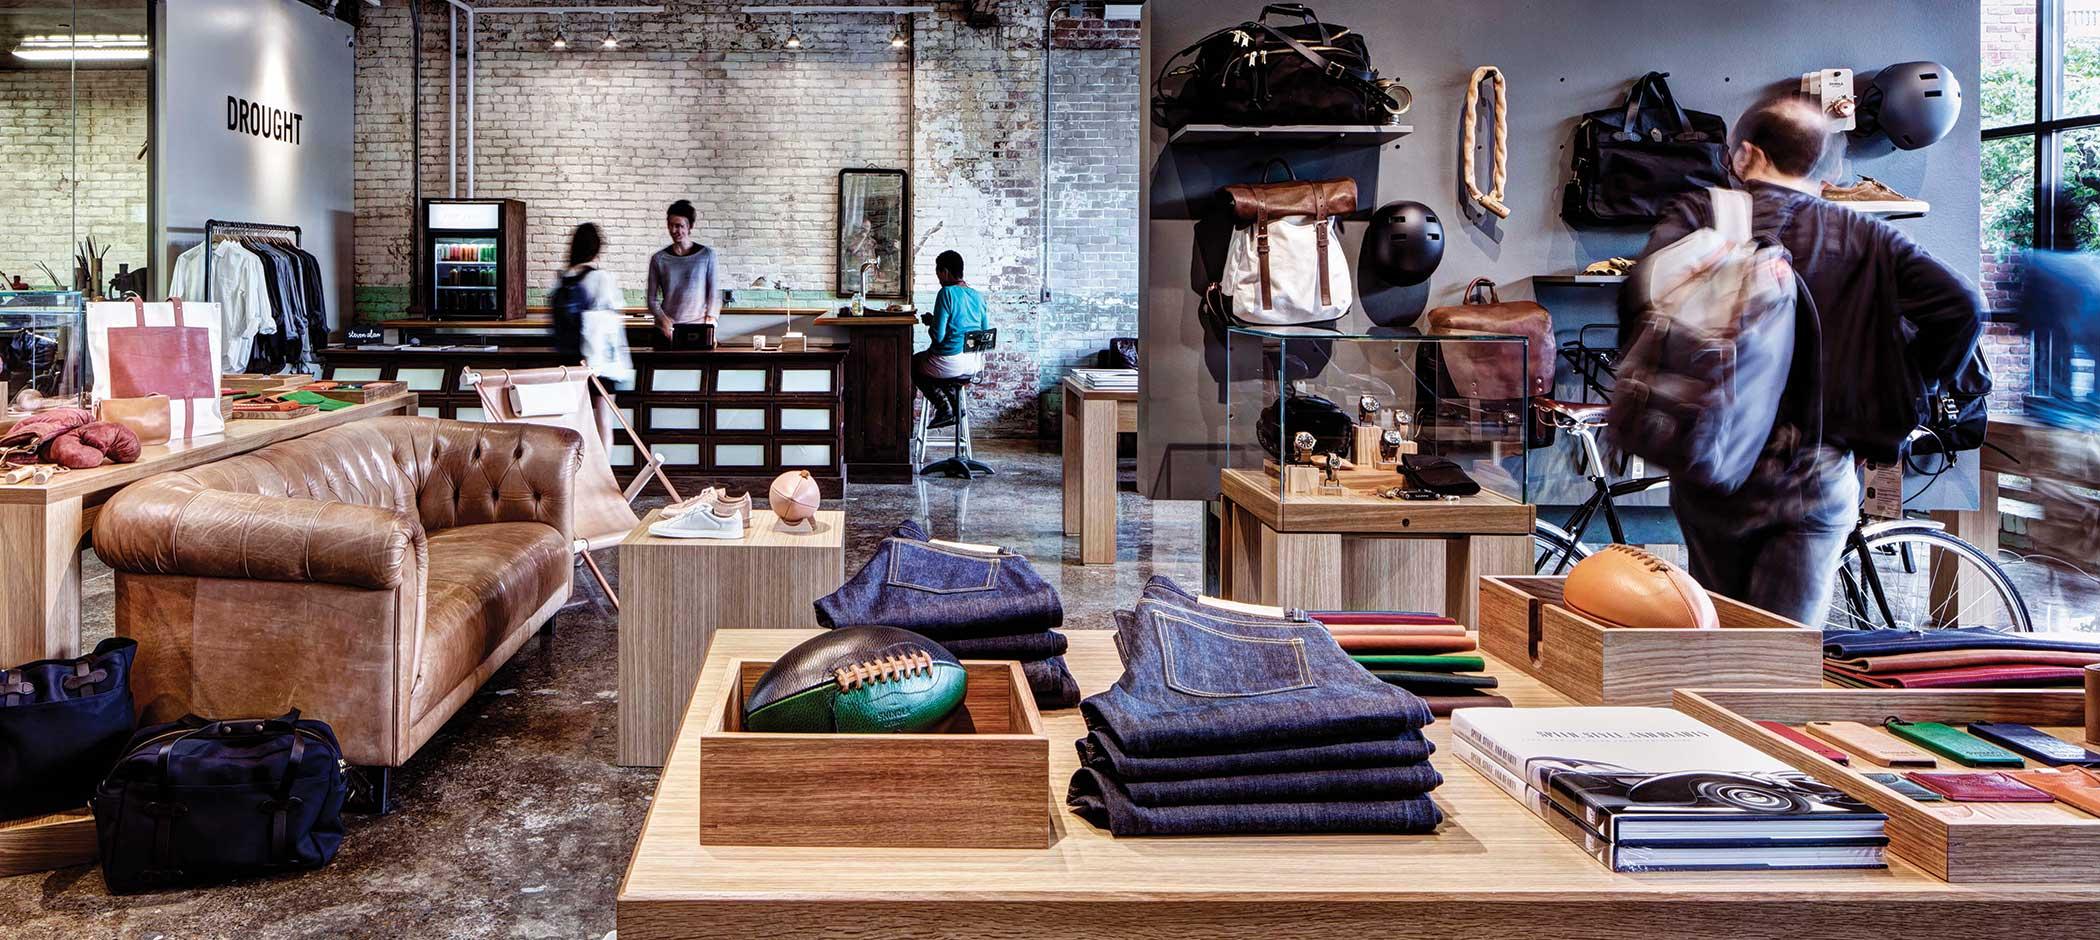 Shopping in Detroit at Shinola